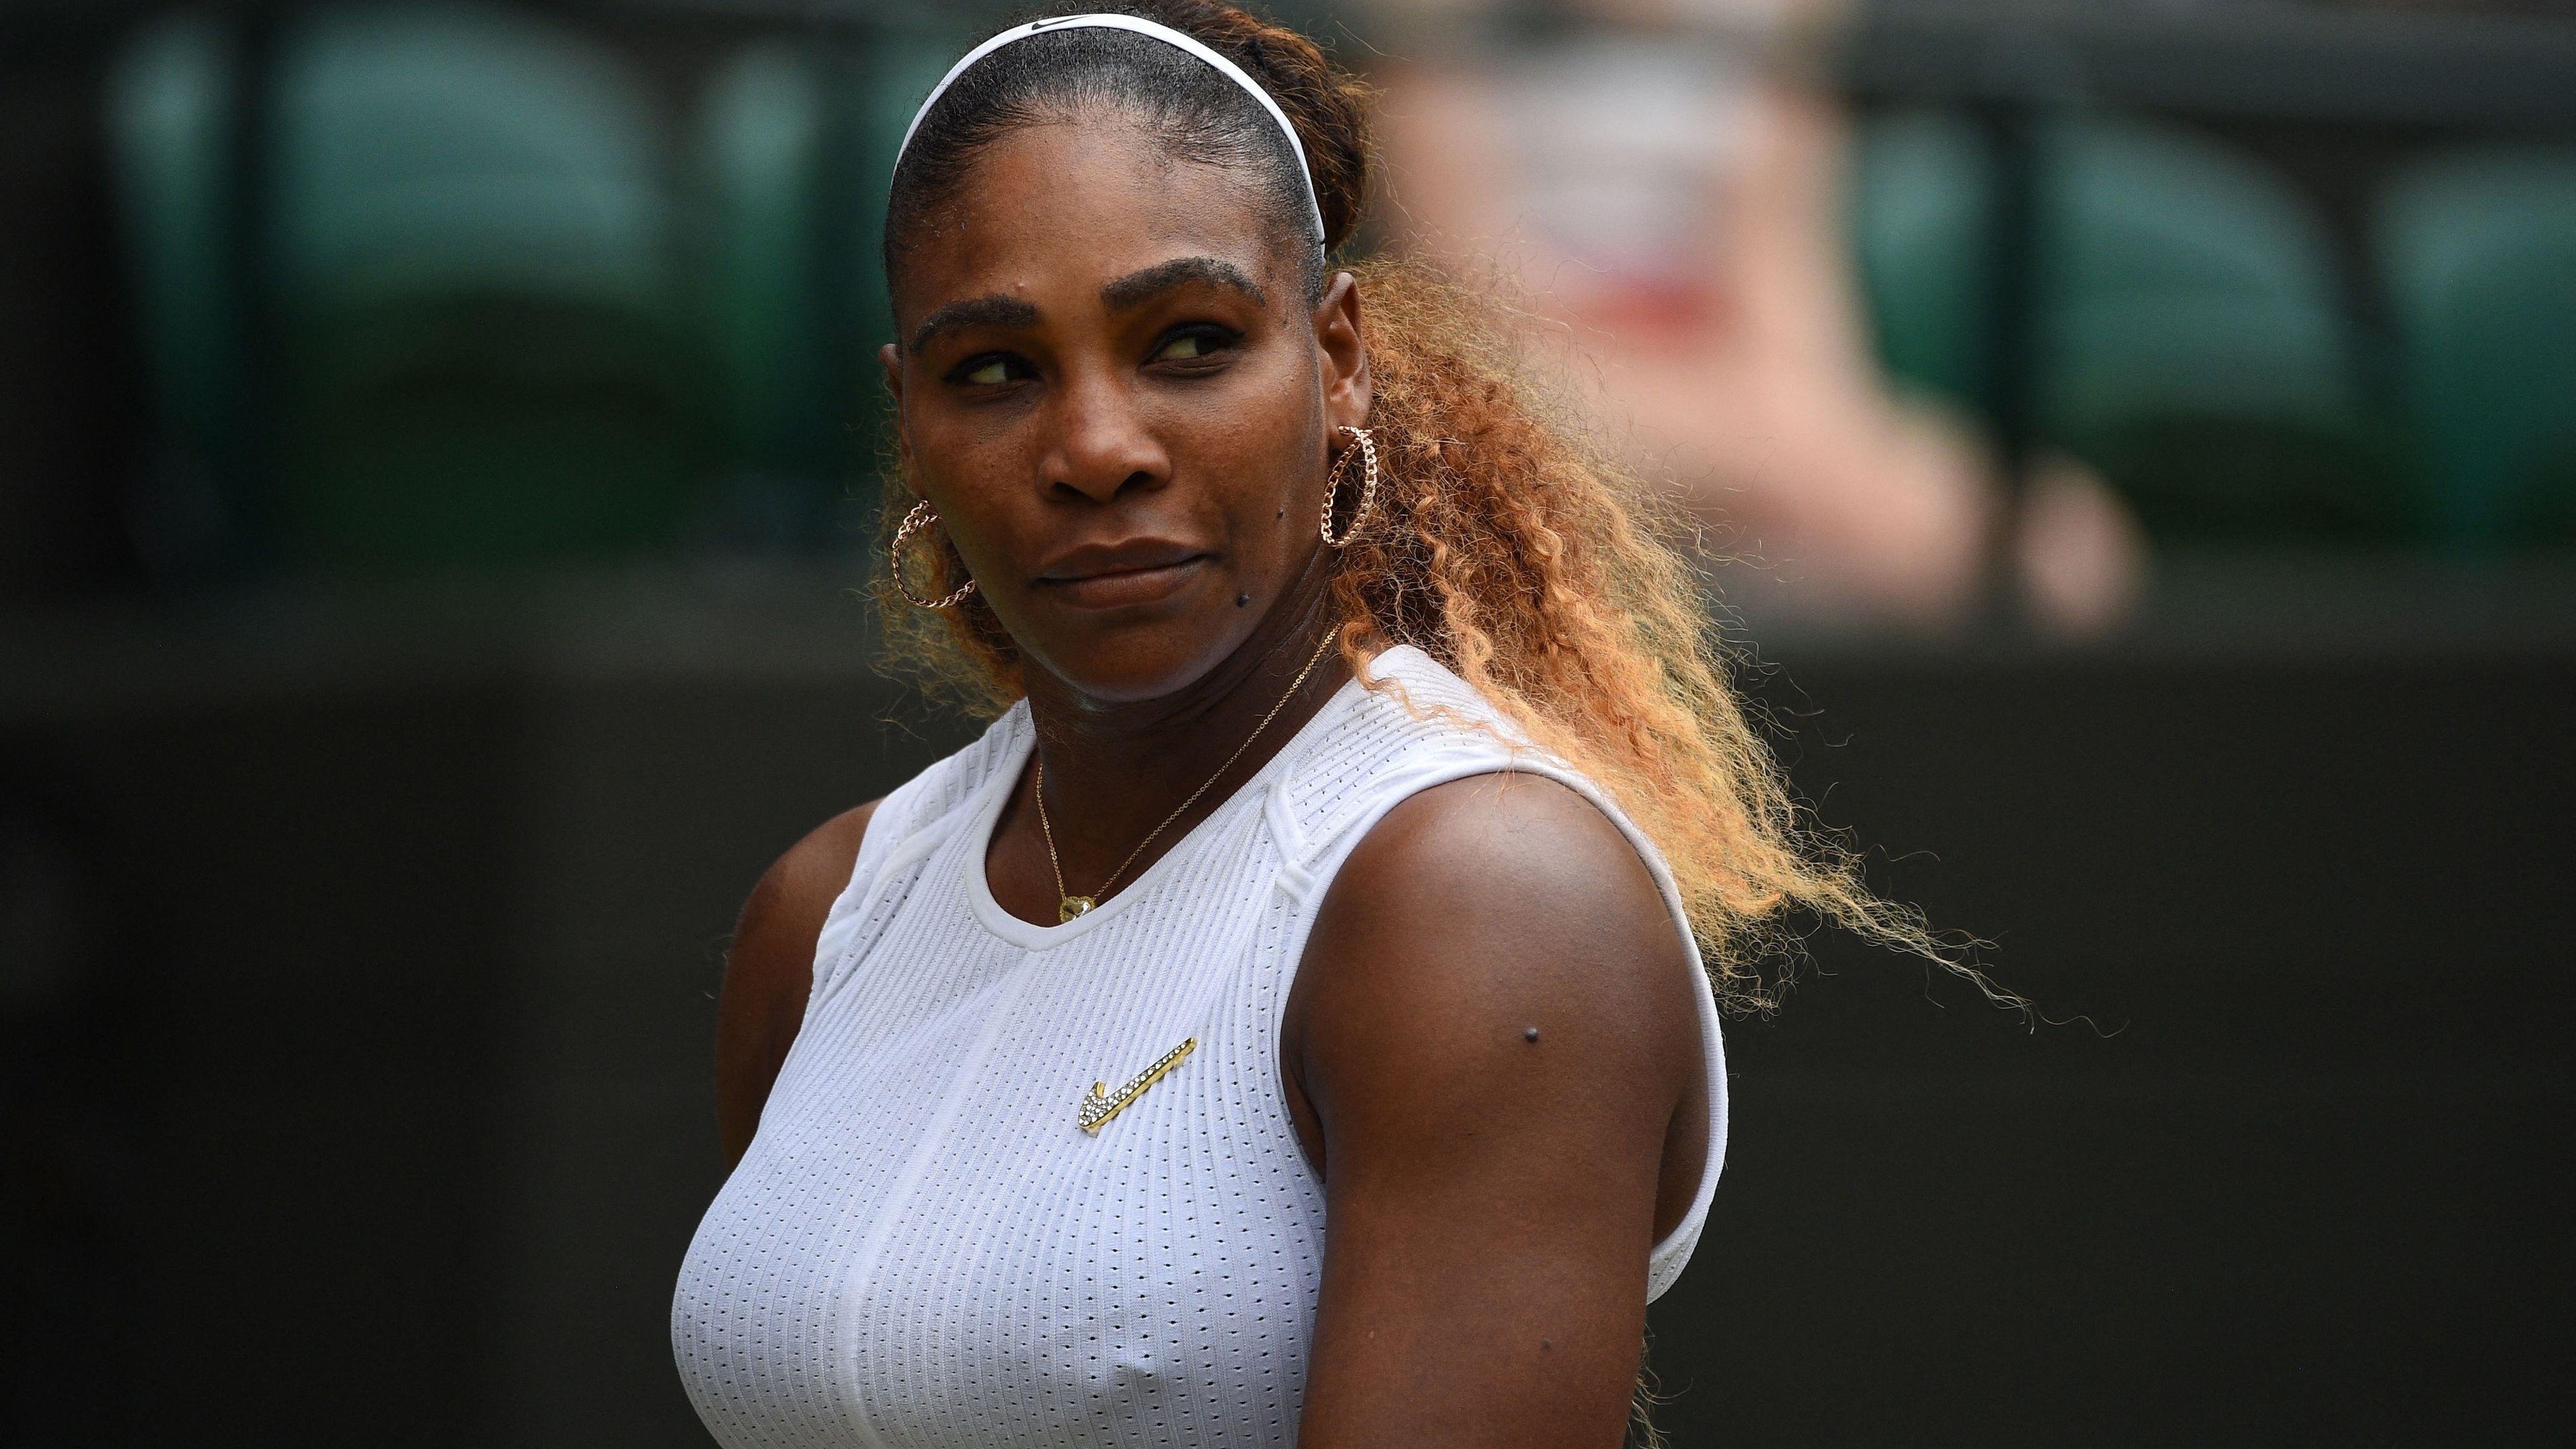 Peter FitzSimons defends Serena Williams over Ash Barty Wimbledon snub